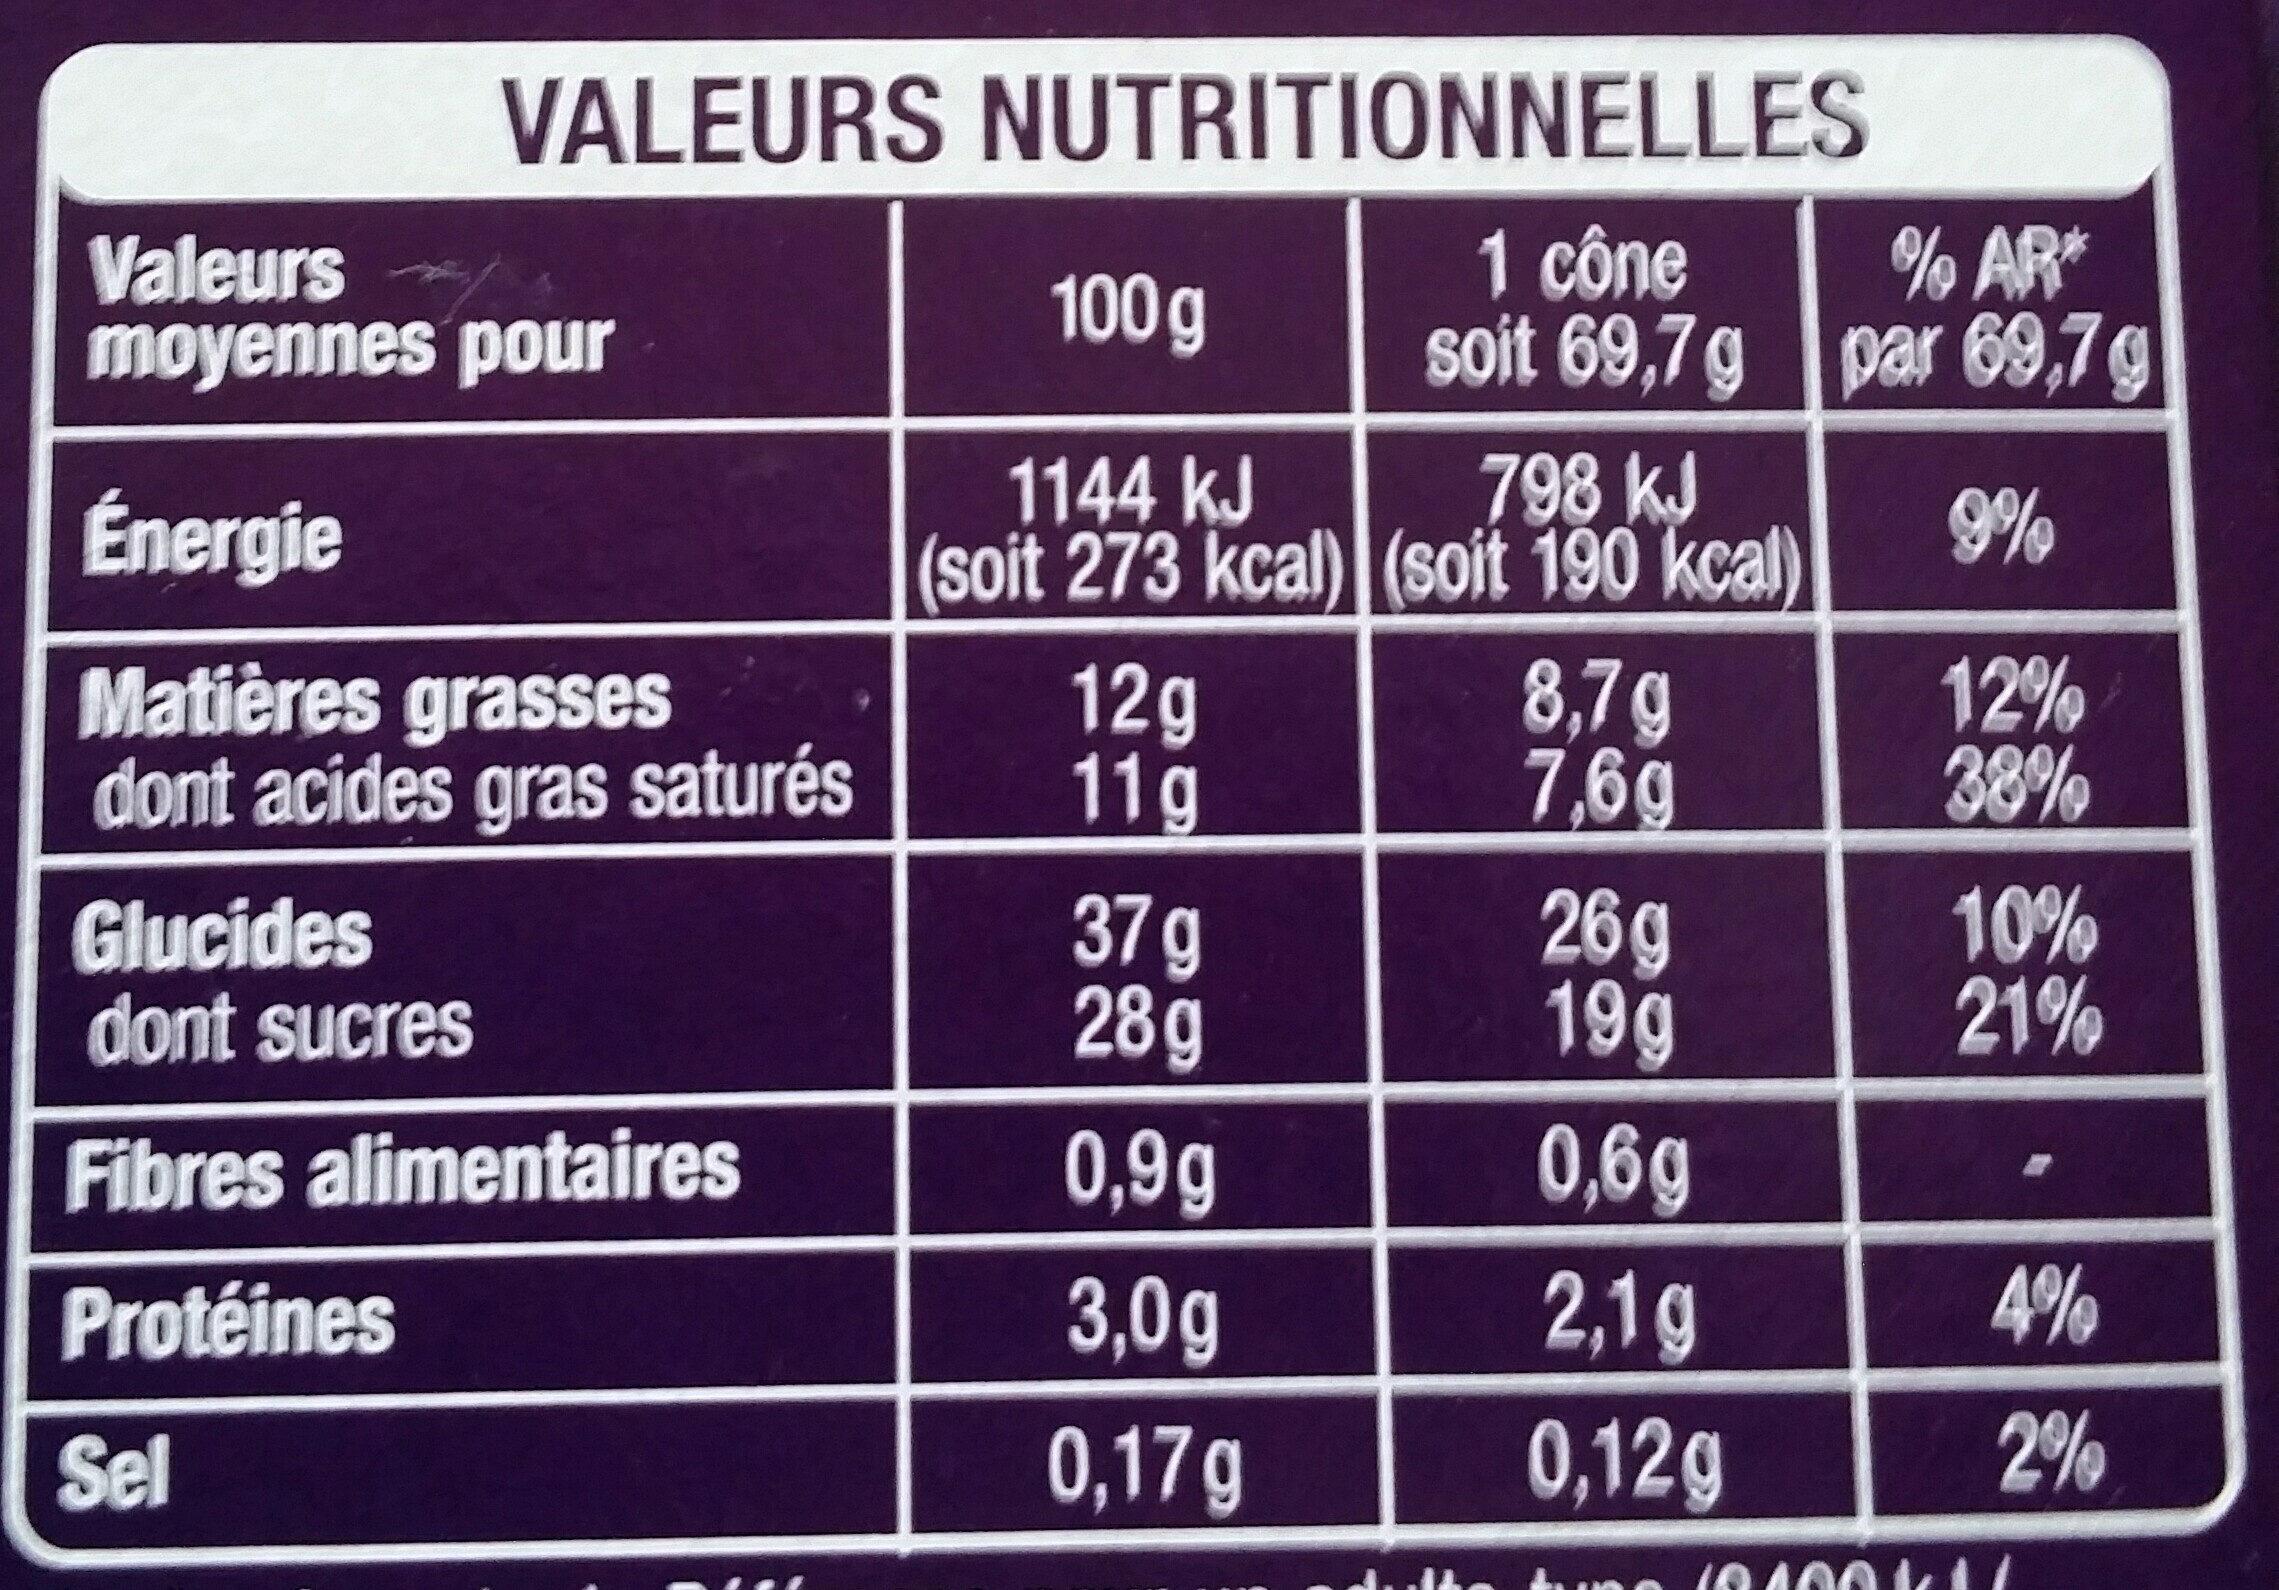 Cône rhum raisin x6 - Informations nutritionnelles - fr